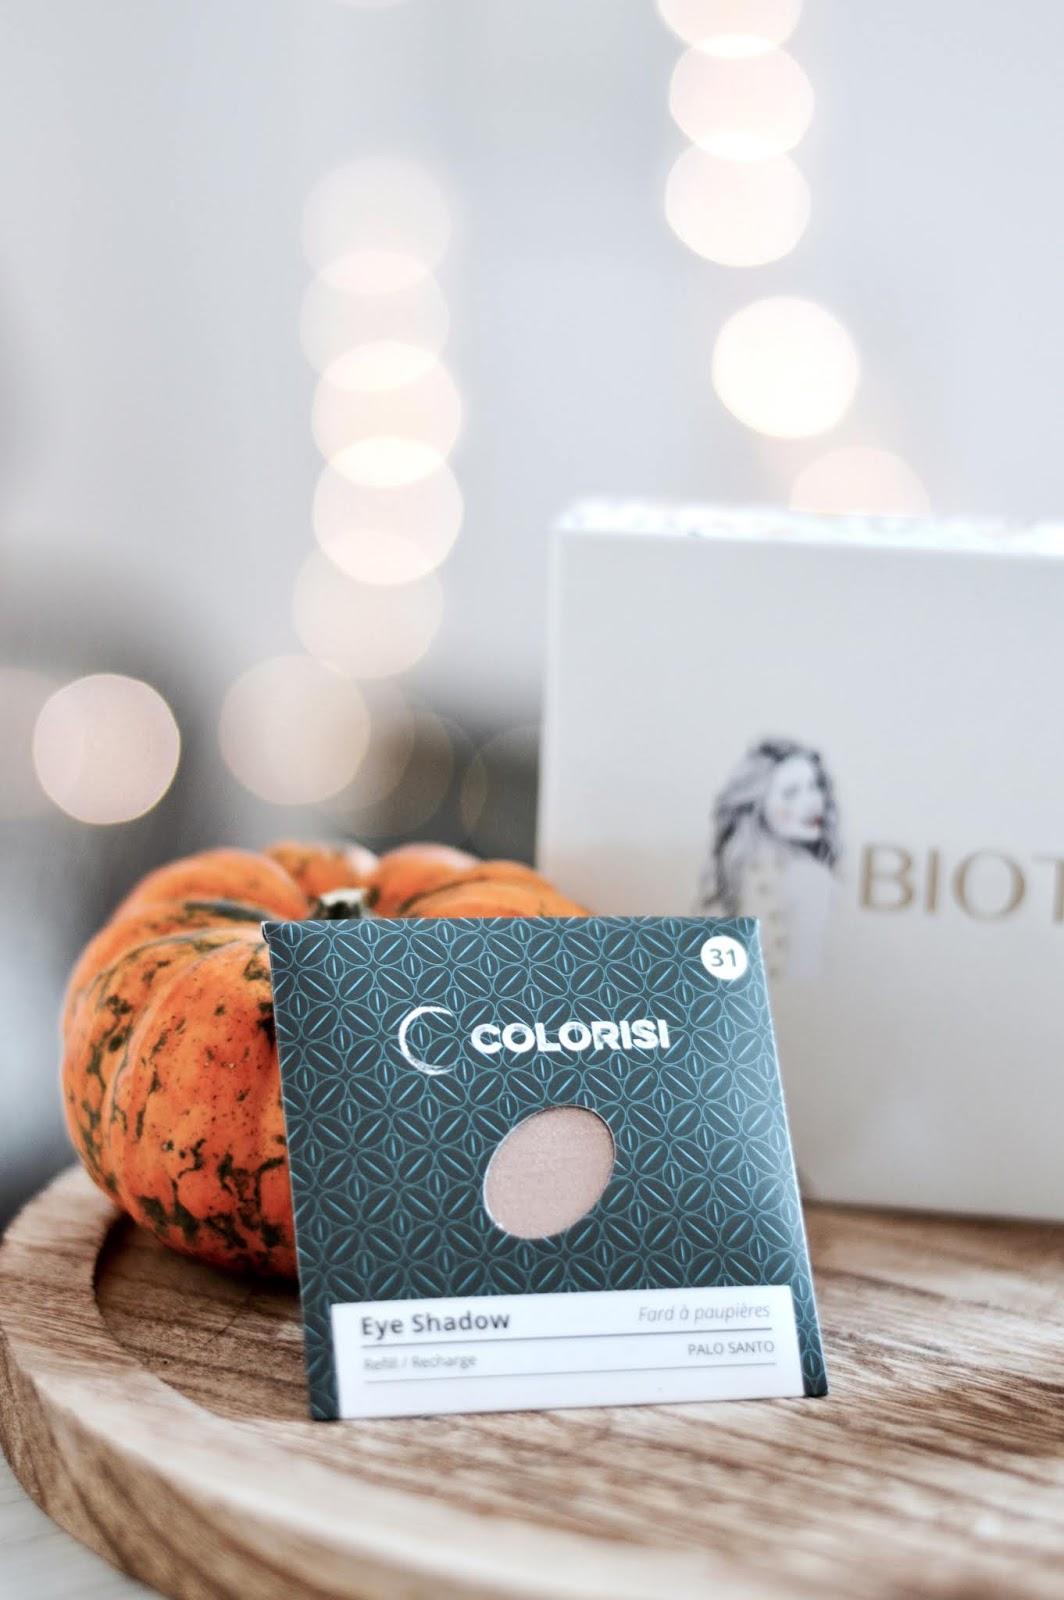 Biotyfull Box : box beauté bio 100% maquillage